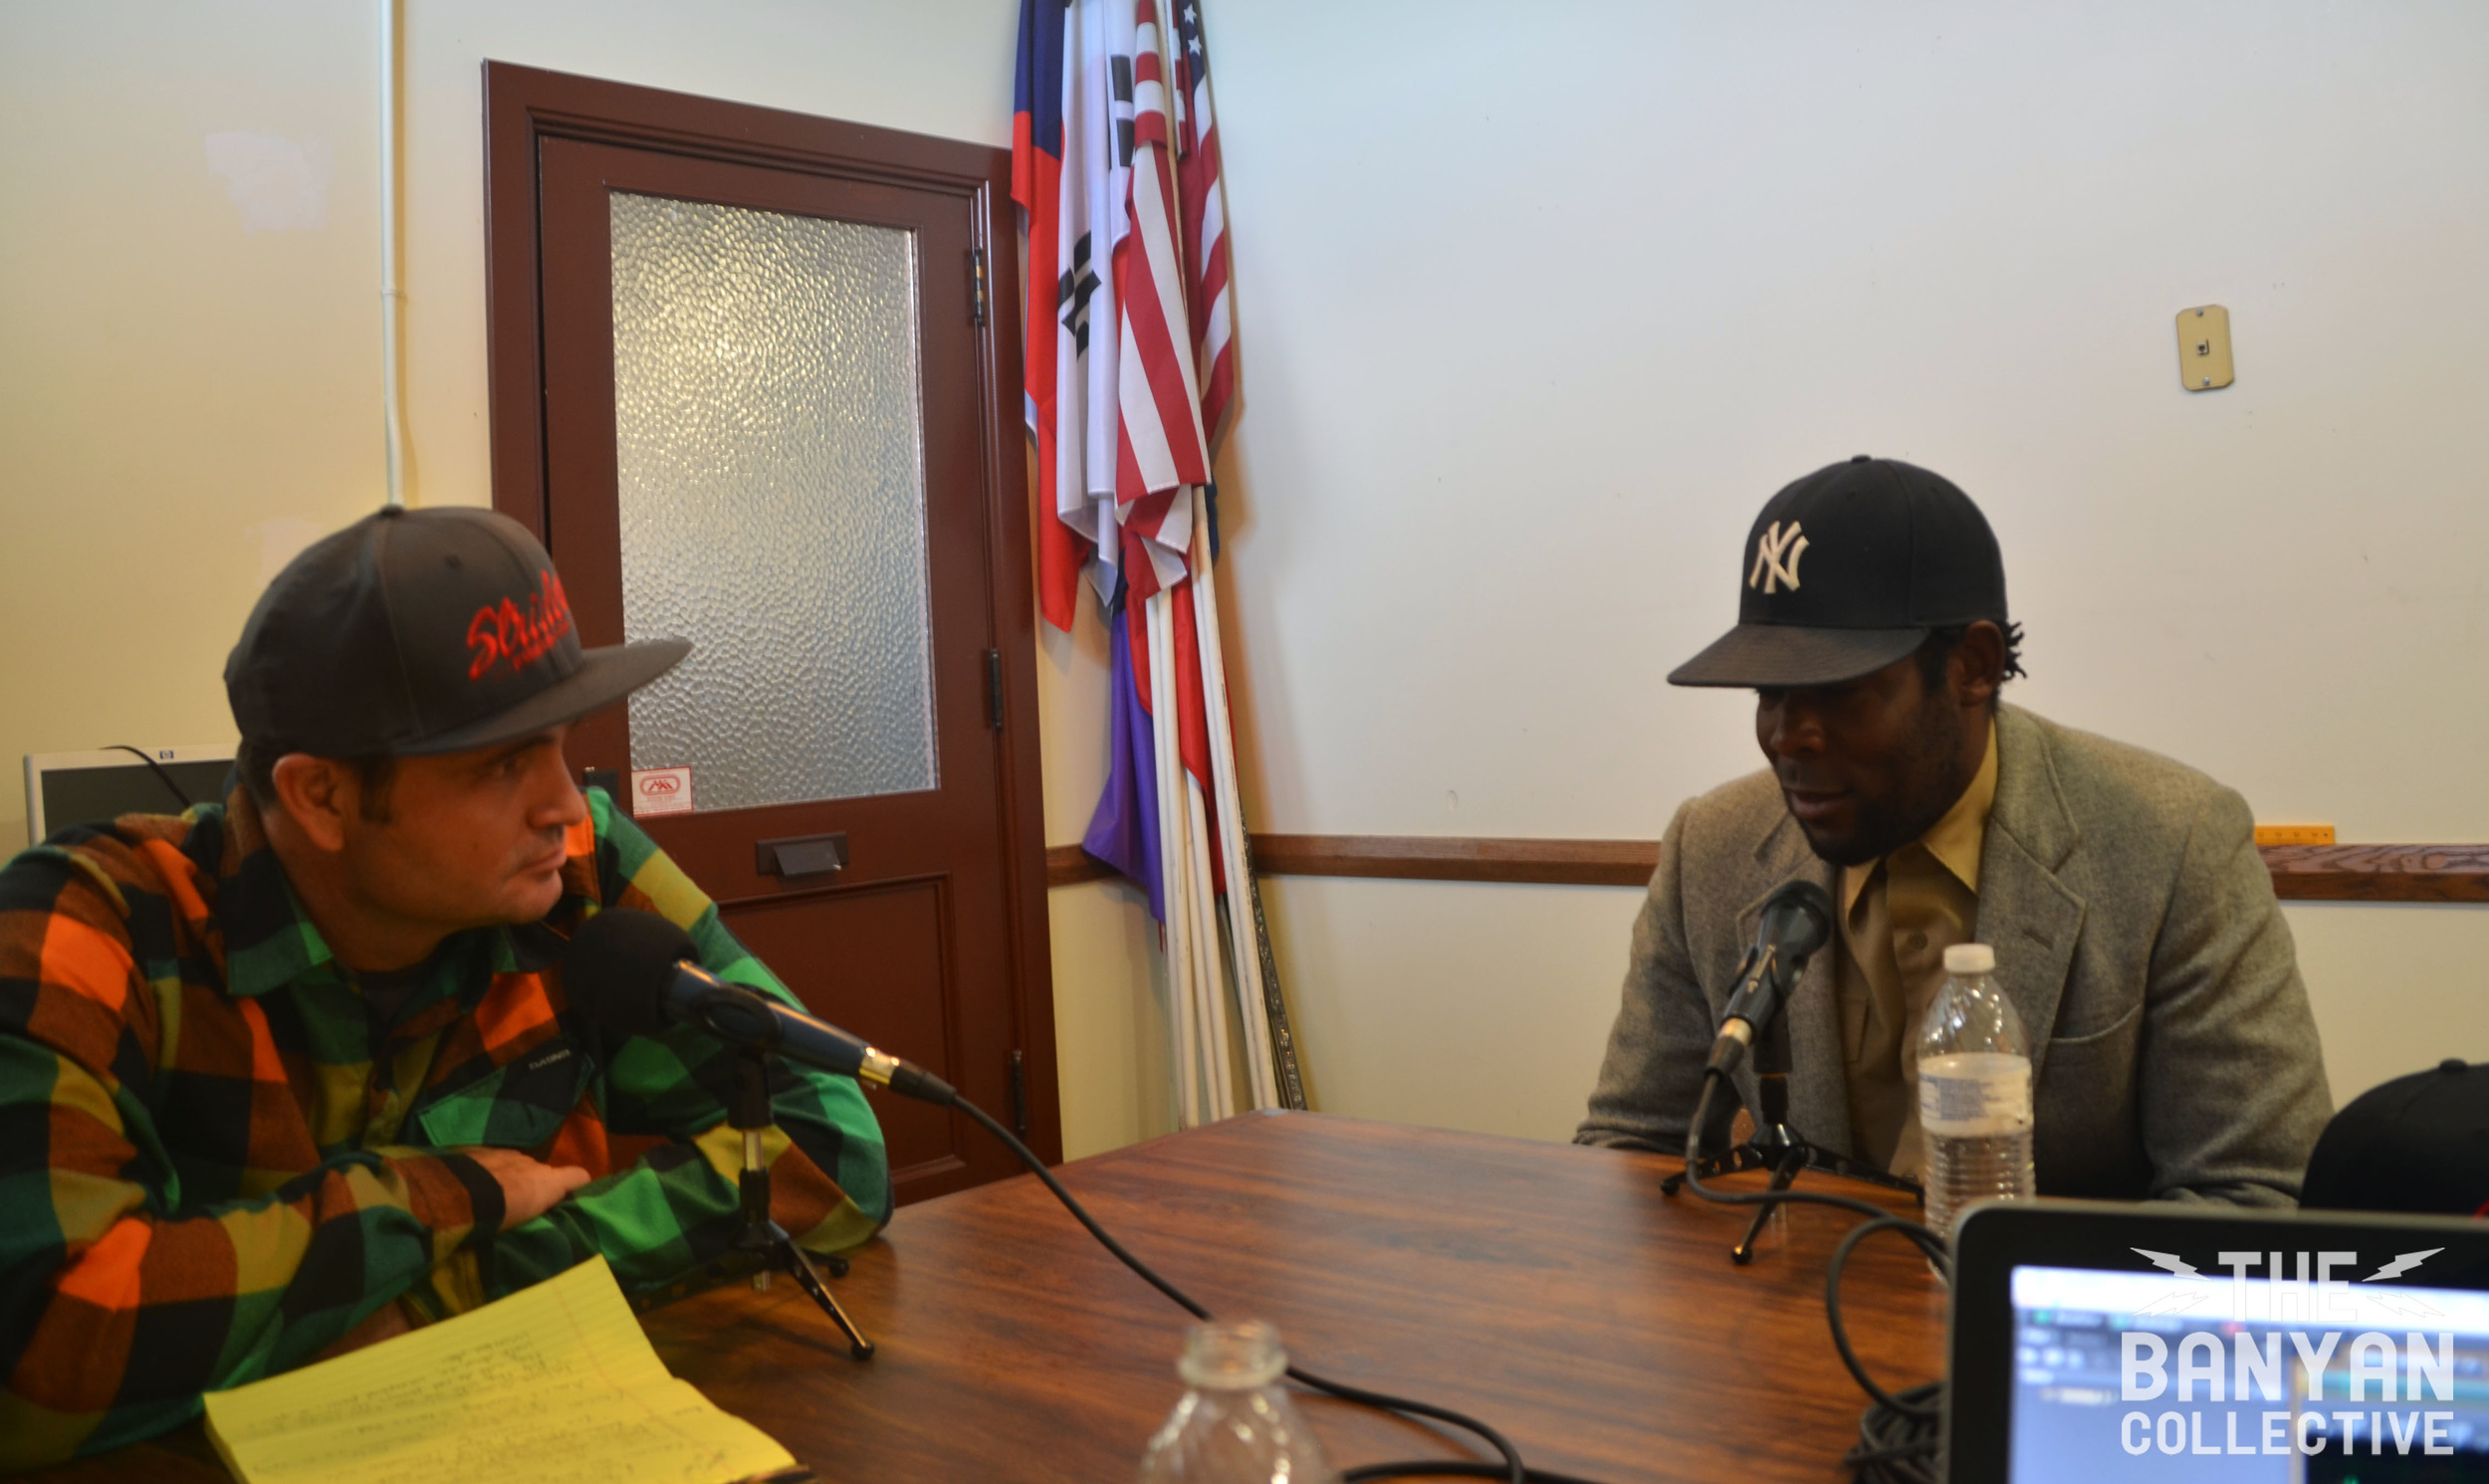 Banyan Host, John Wojciechowski with Amir Jackson on Mr. Goodyear's Neighborhood